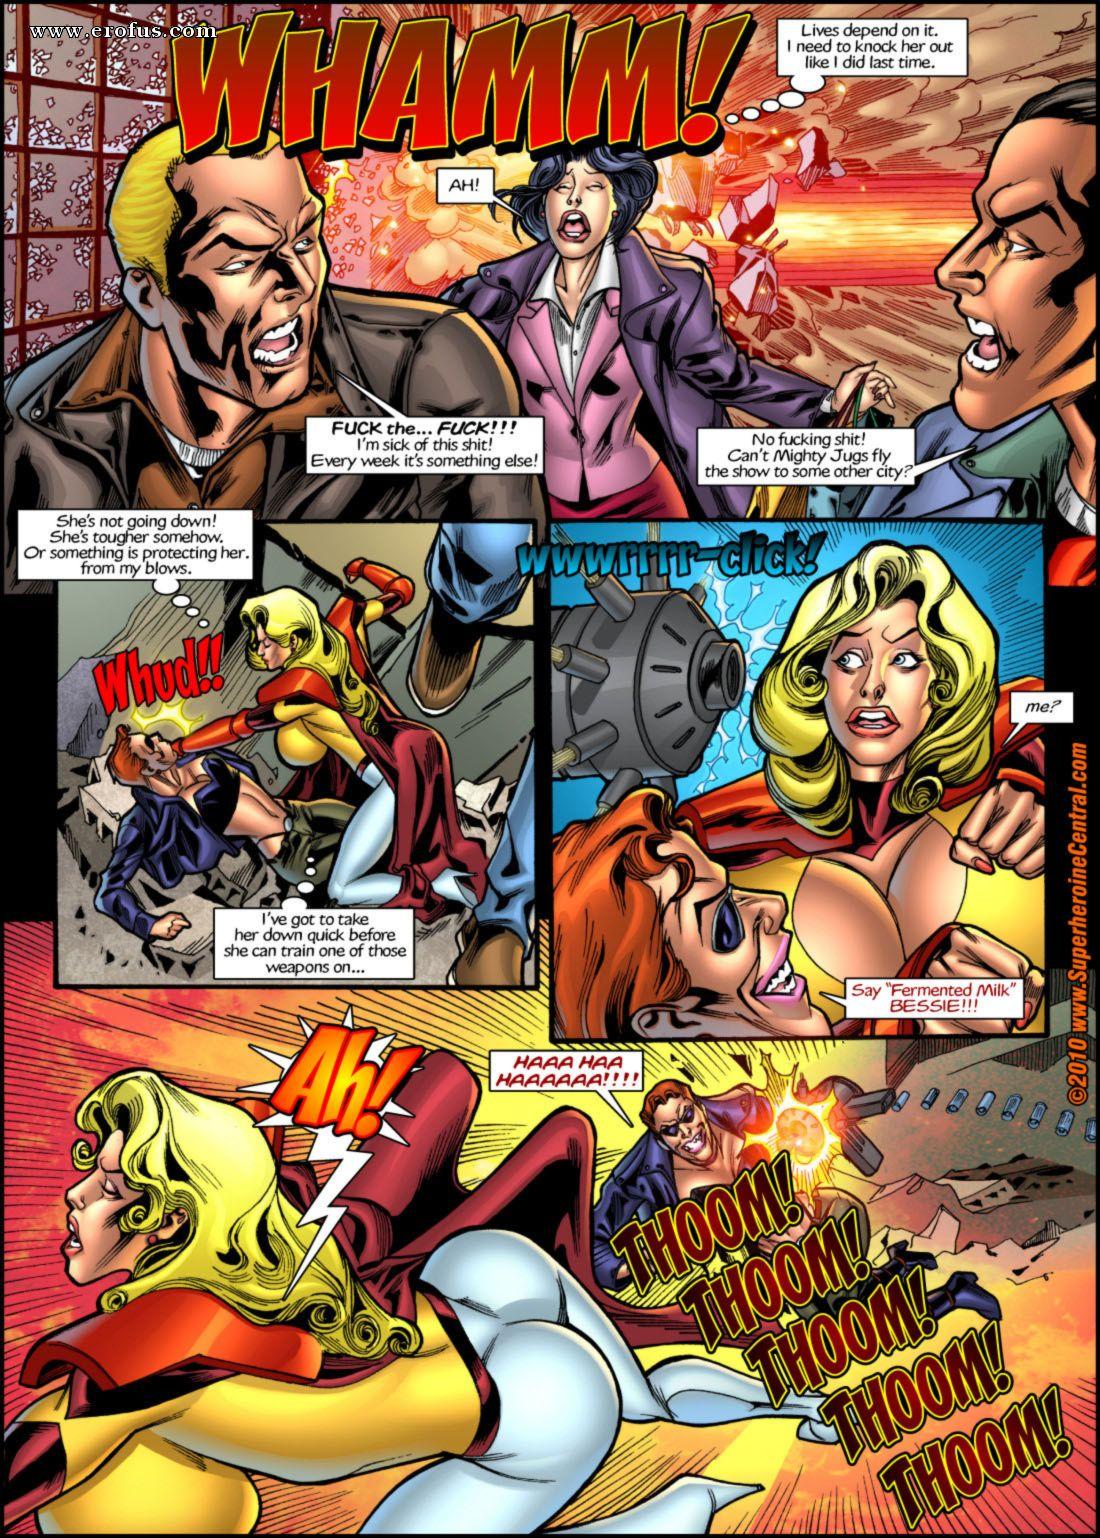 Superheroinecentral Stories